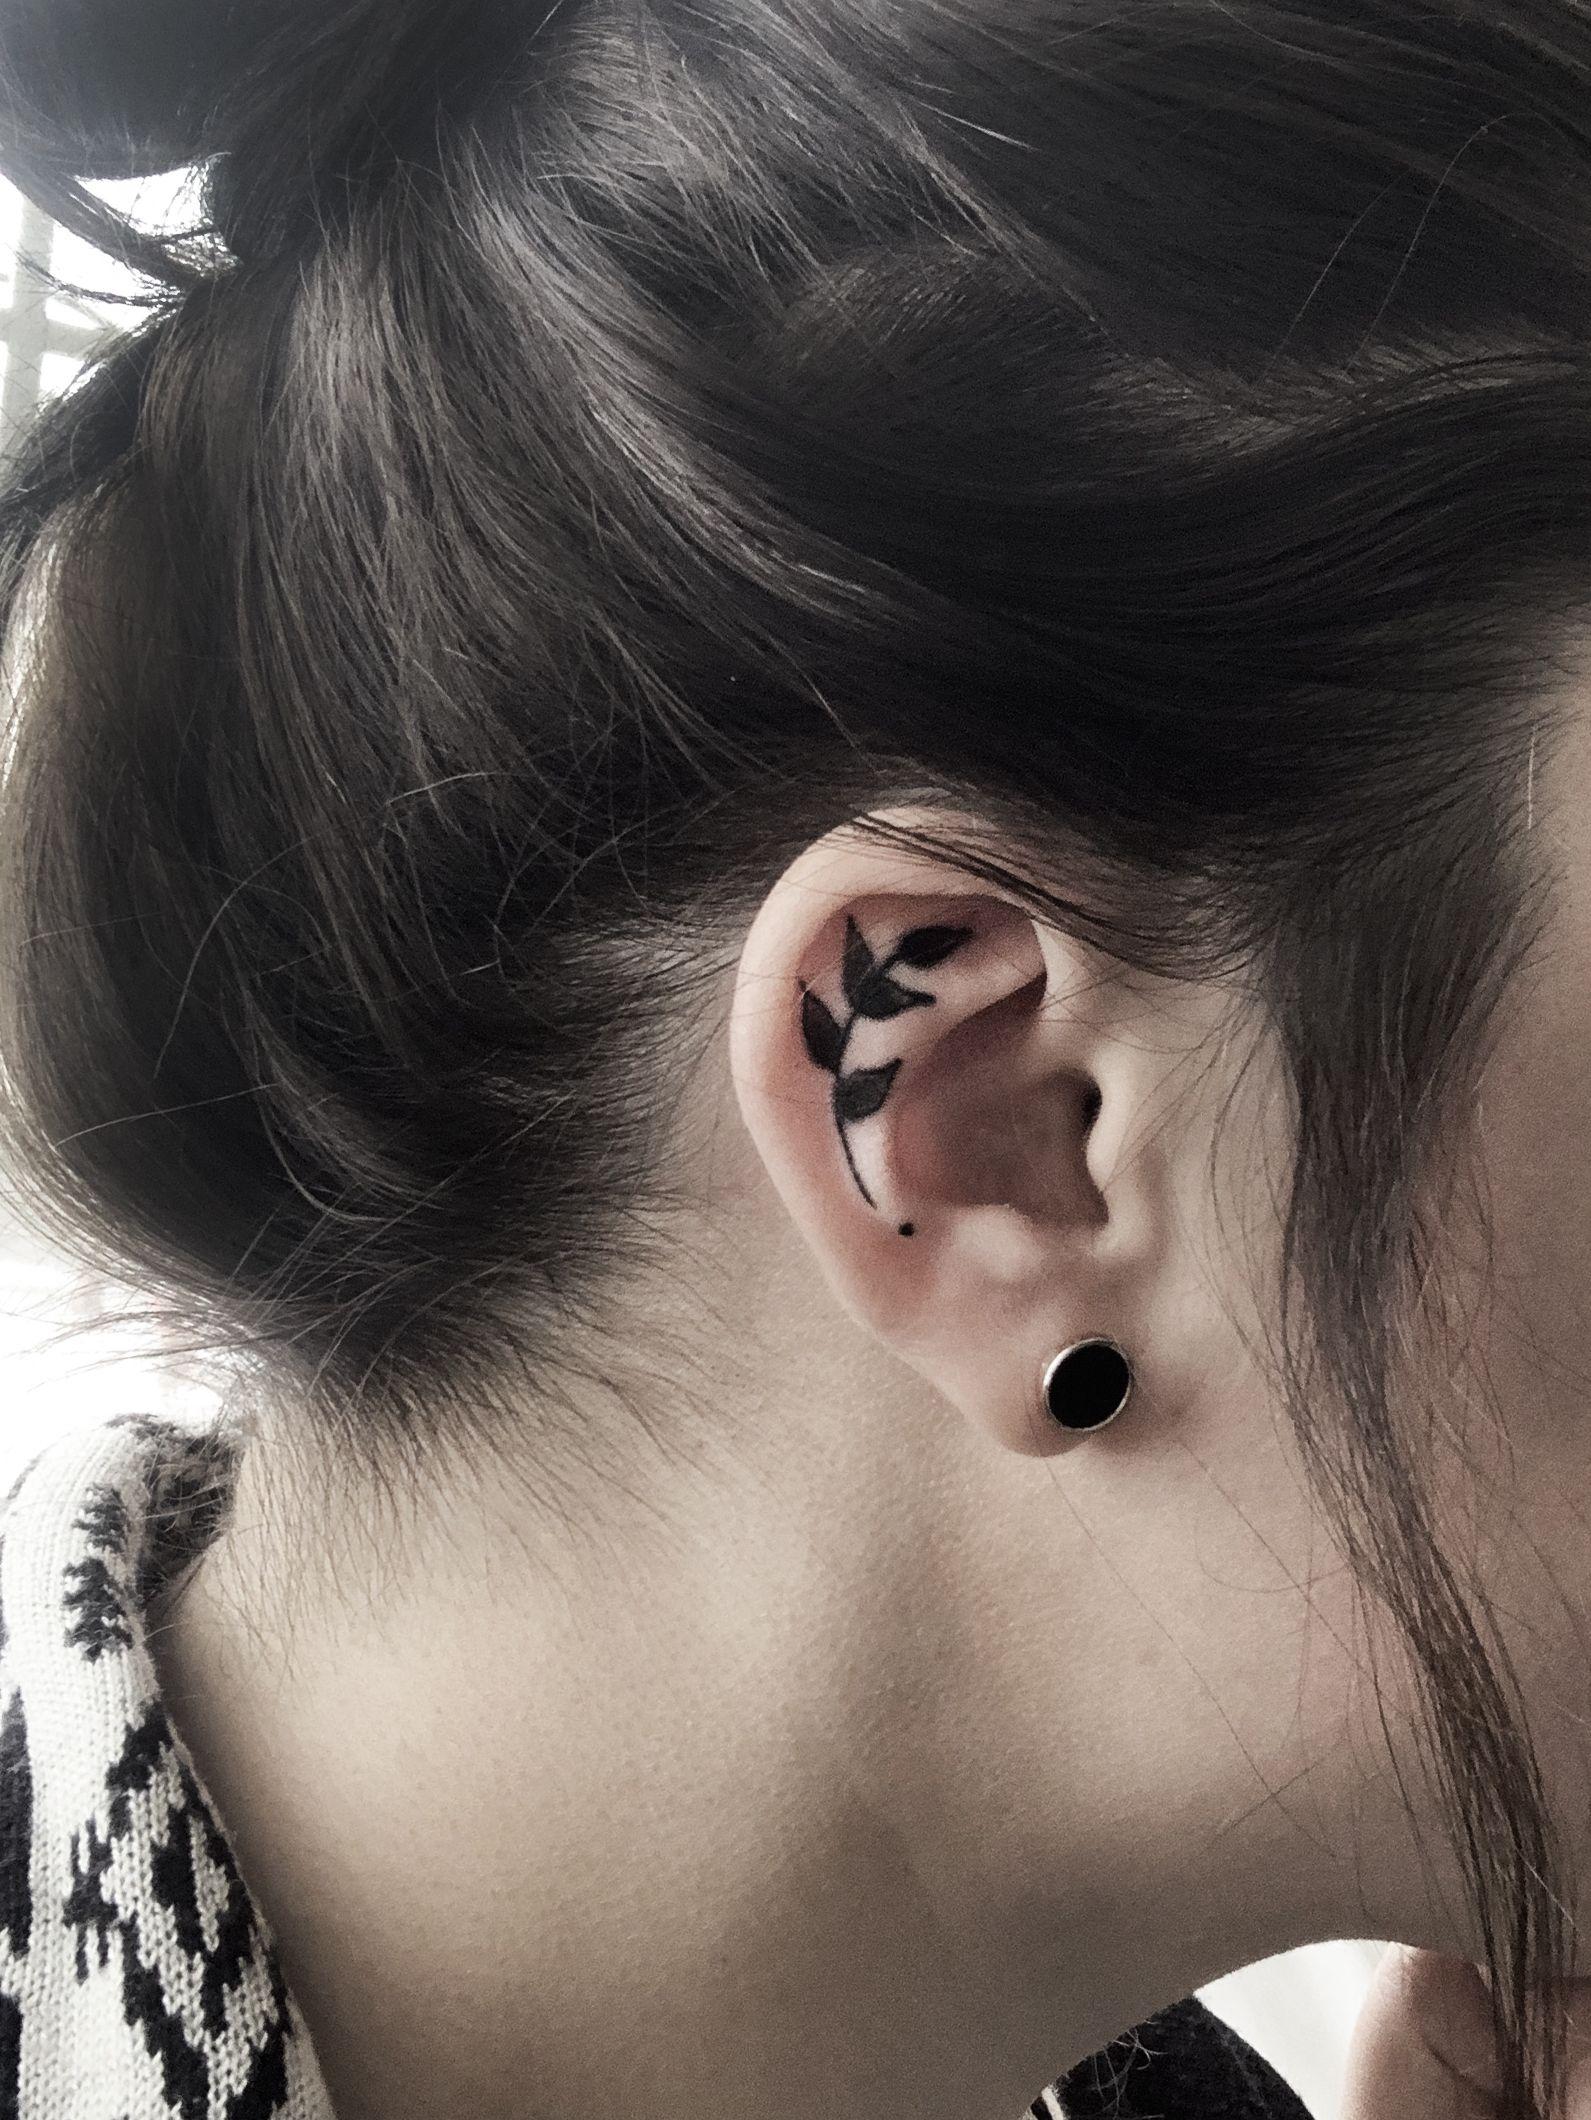 Inner Ear Tattoo Small Leaf Black On Cartilage Minimalist Simple In 2020 Inner Ear Tattoo Small Tattoos Tattoos